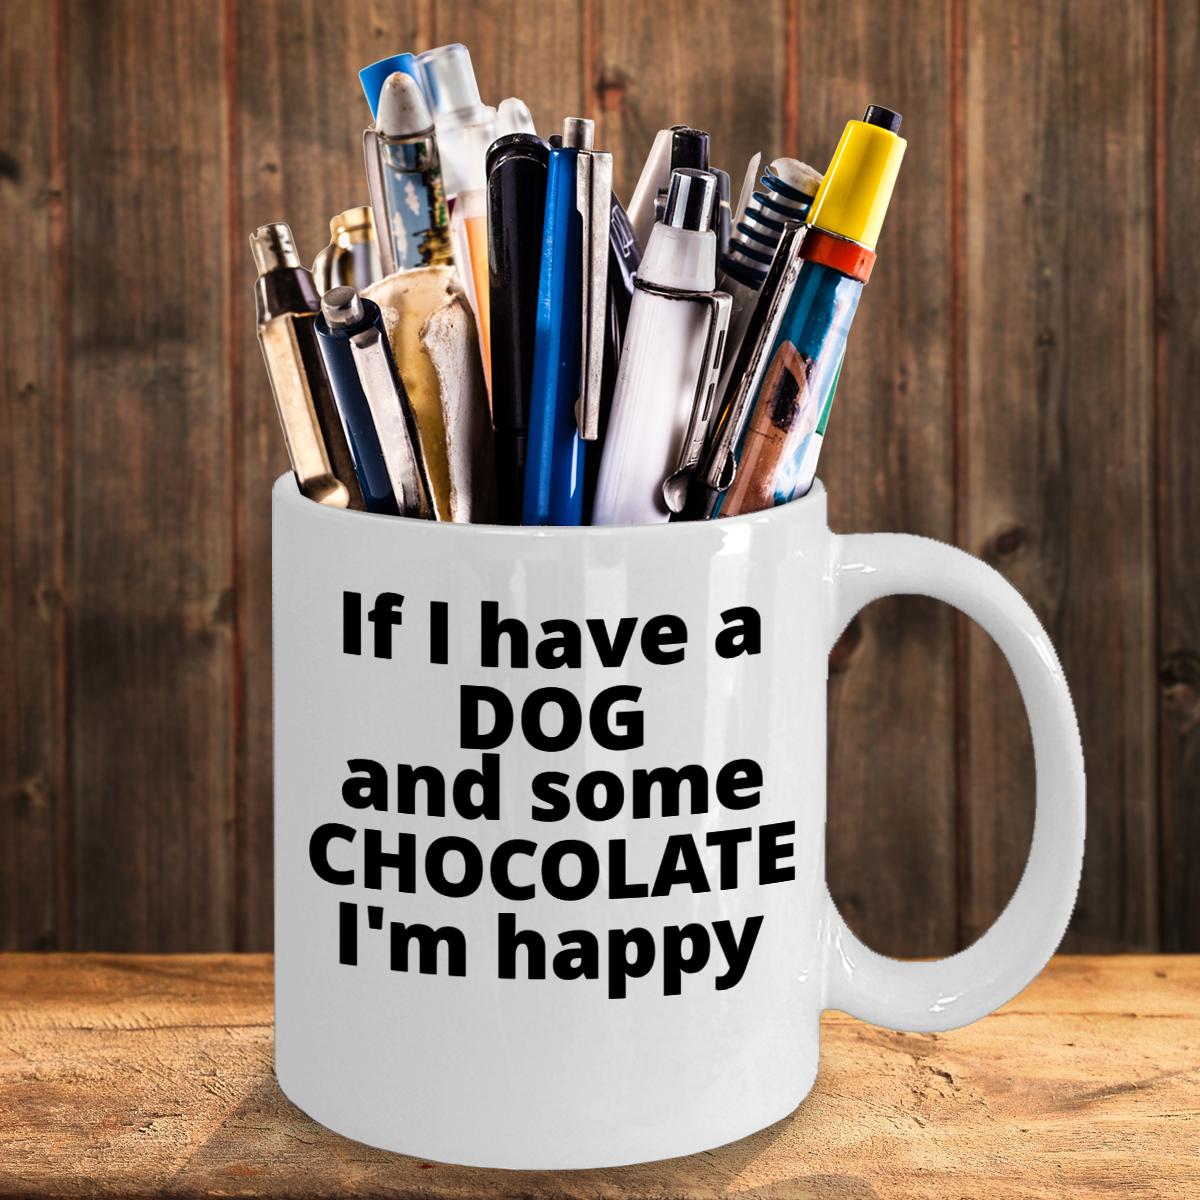 Dog owner mug// dog lover mug// dog and chocolate